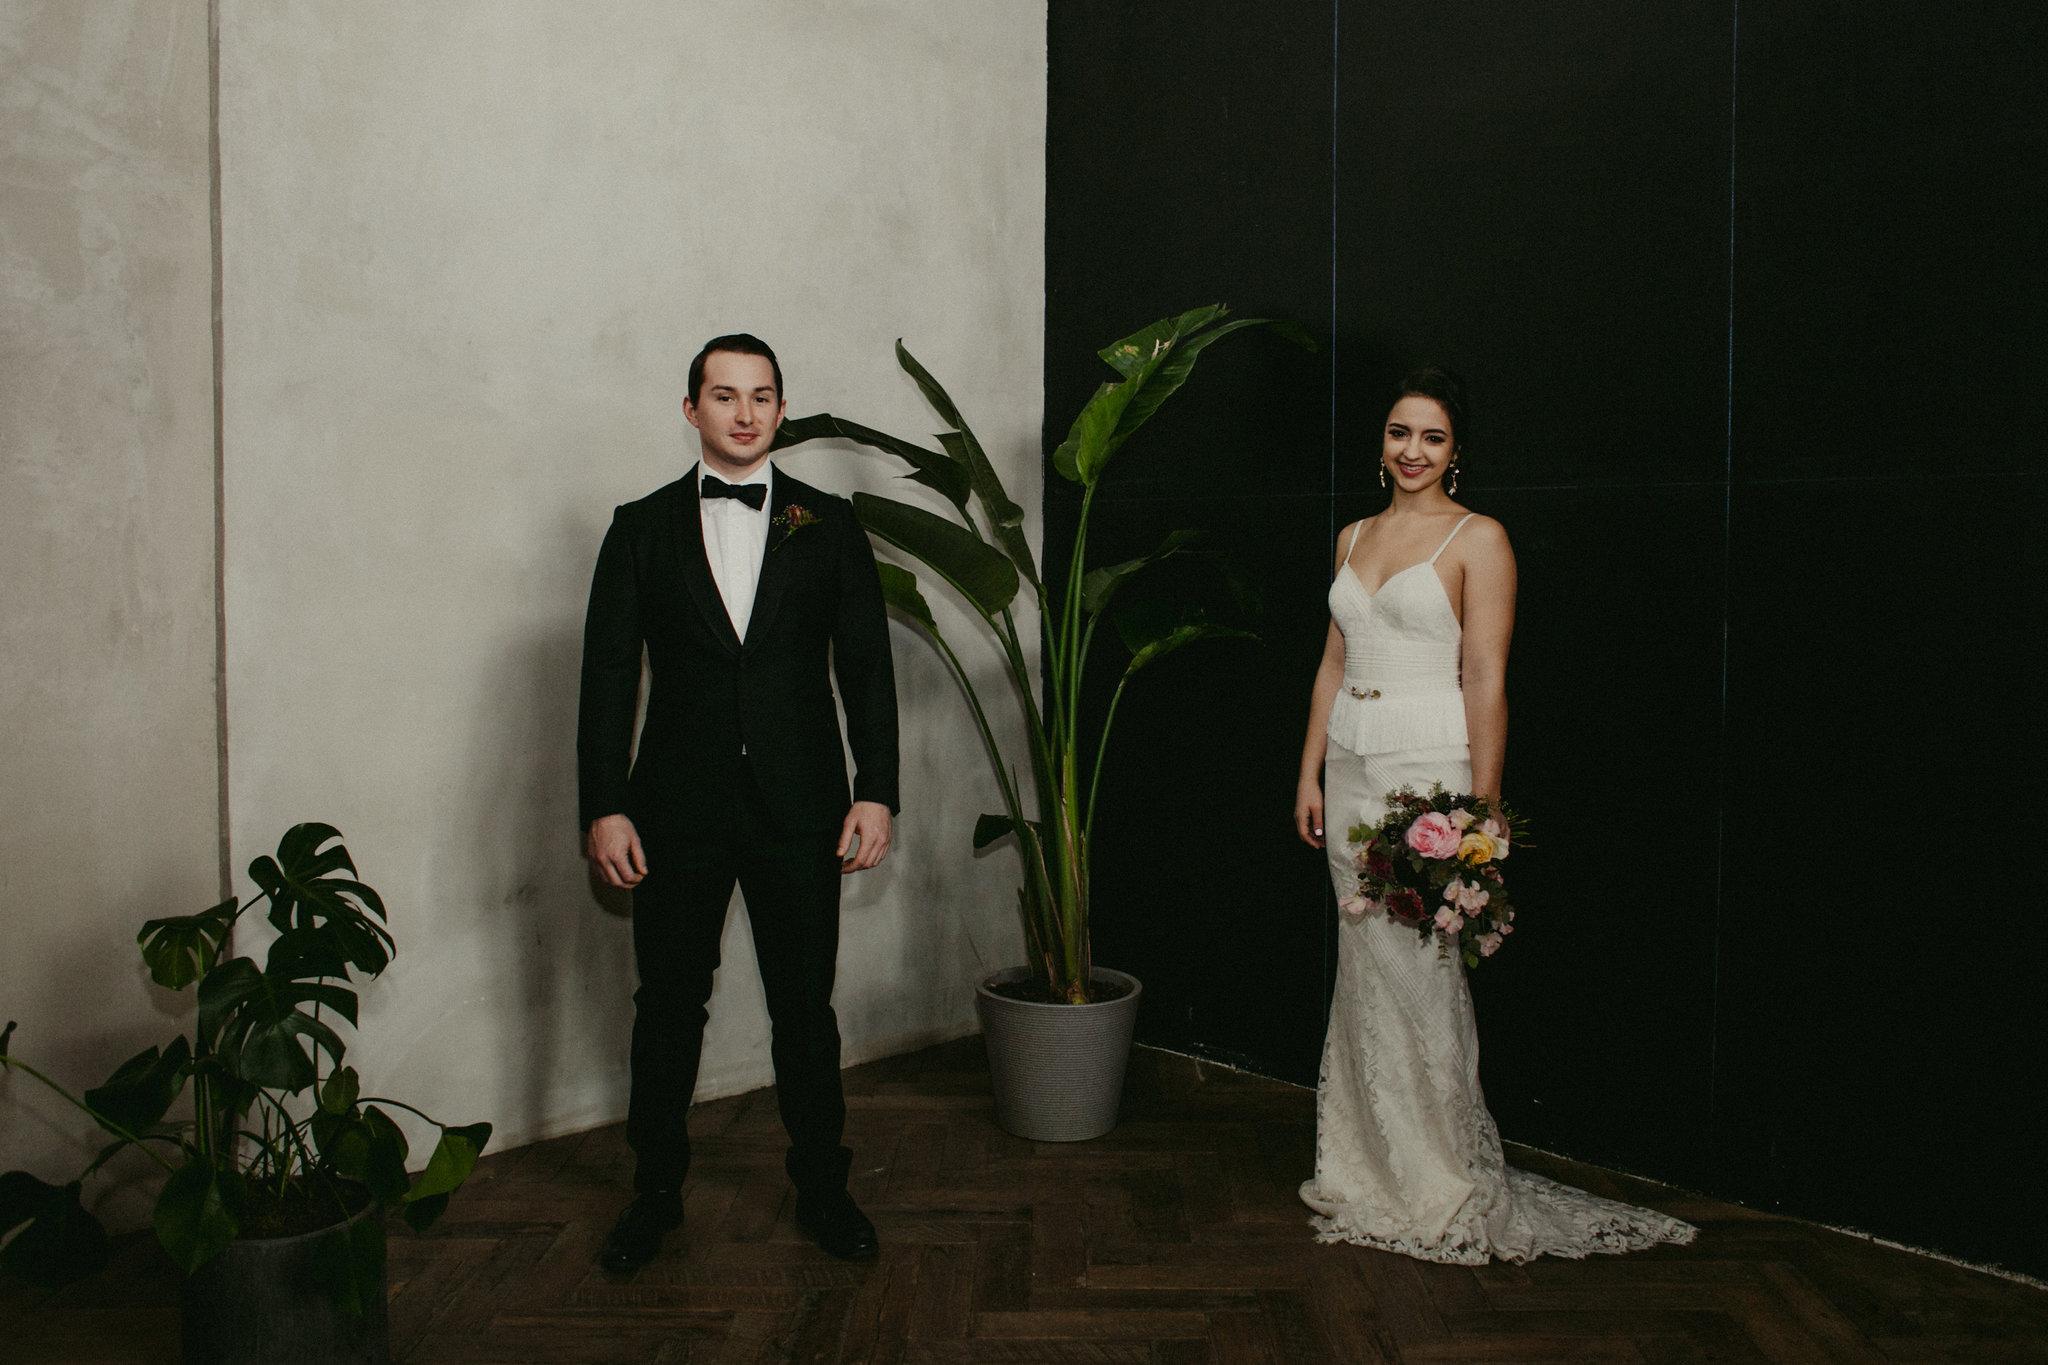 Williamsburg_Hotel_Wedding_Photographer_Chellise_Michael_Photography-218.jpg